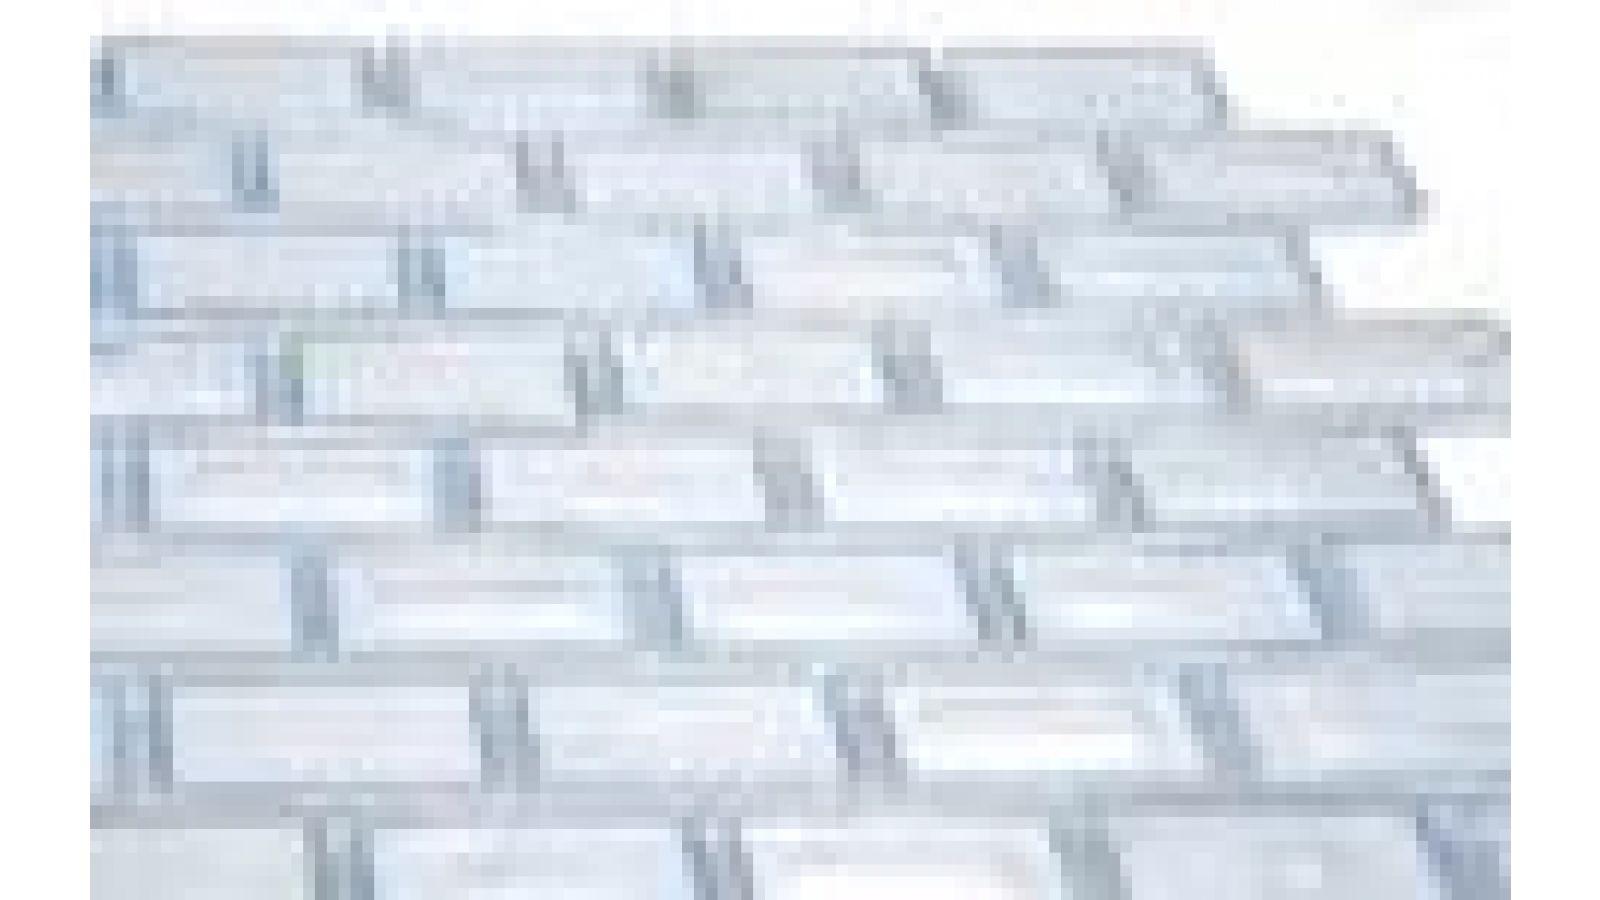 Ashland-e 1x2 Tile - Clear Ice